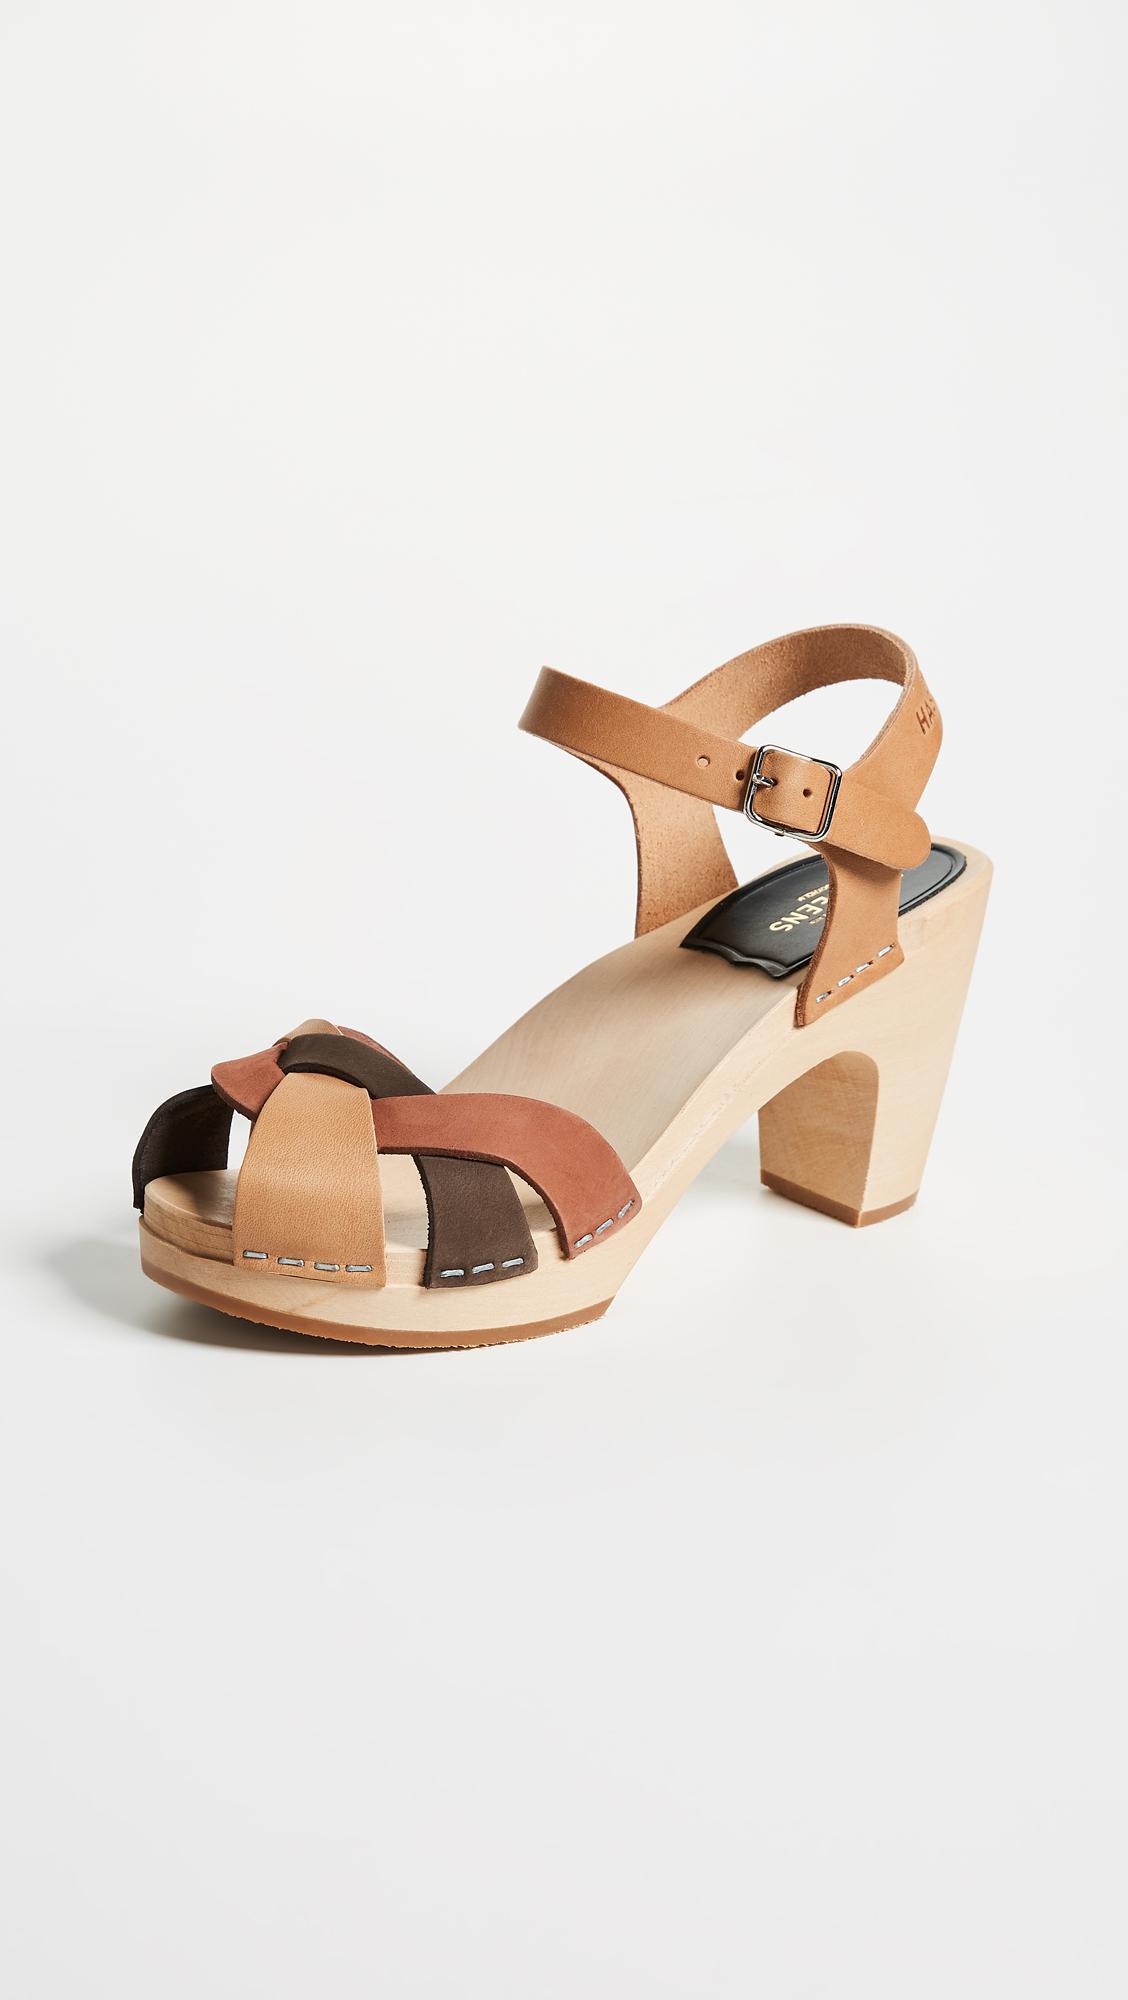 Office Swedish Hasbeens Greek Mid Heel Sandal Particular Discount 100% Original For Sale iCjvwz